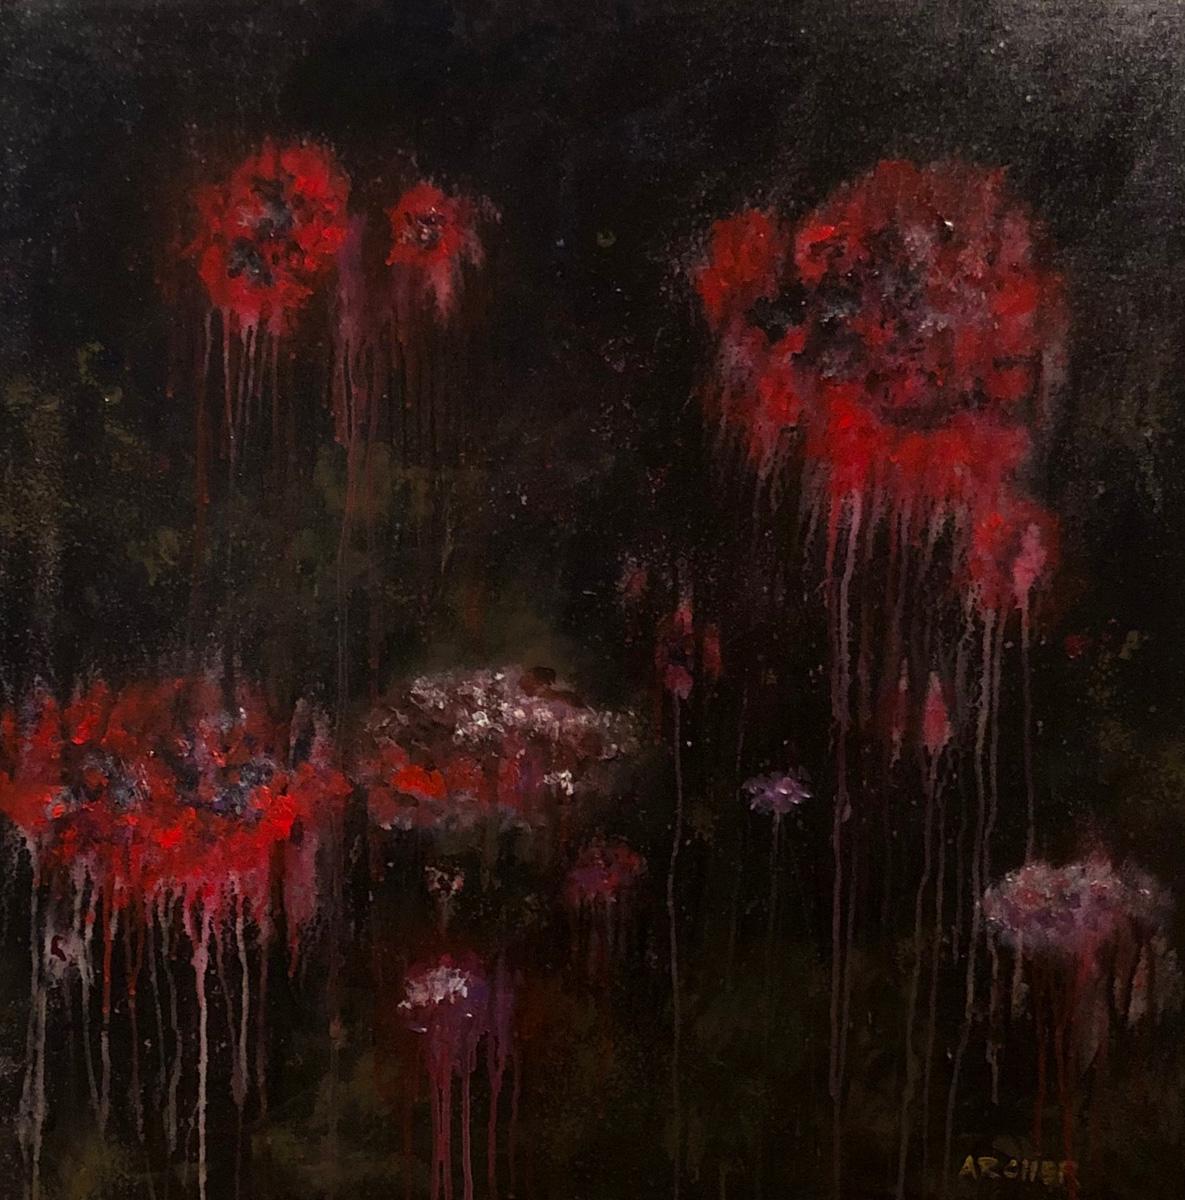 Red Black by John Archer